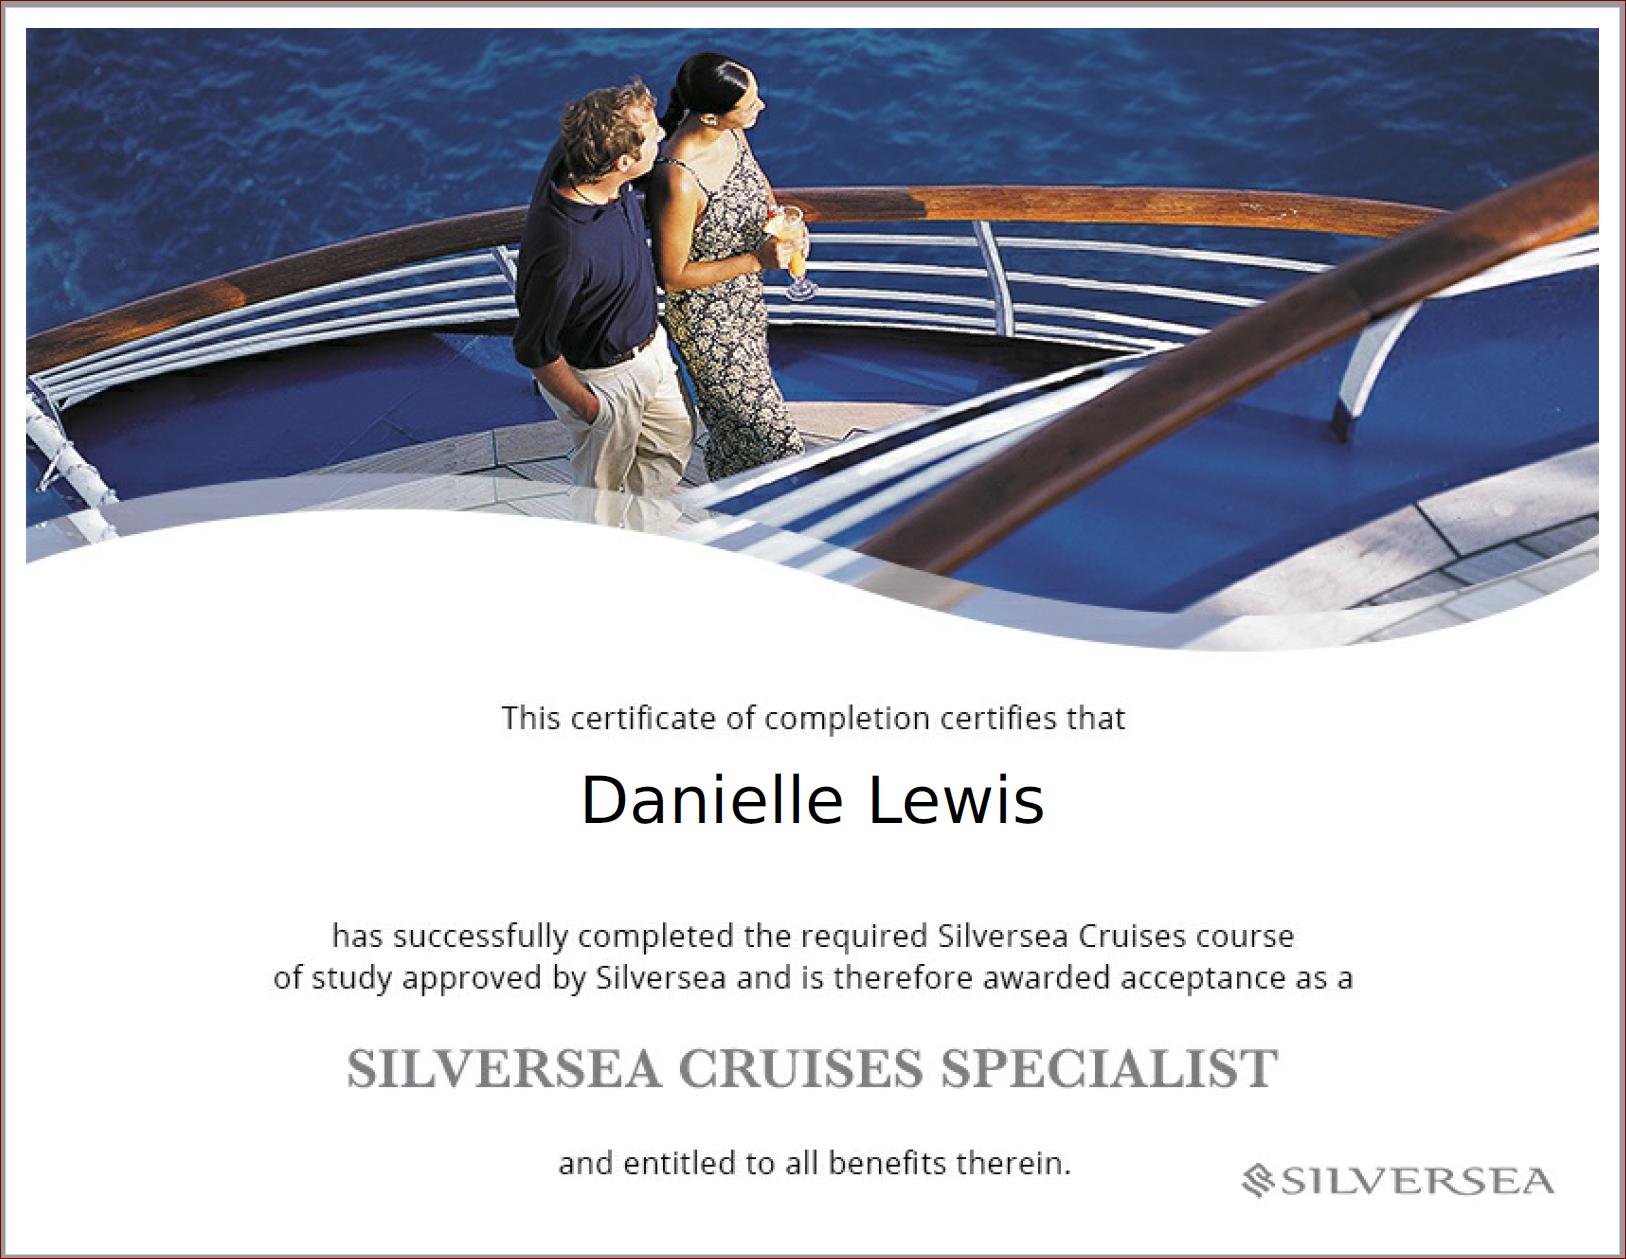 SelfishMe Travel - Silversea Cruises Specialist Certificate